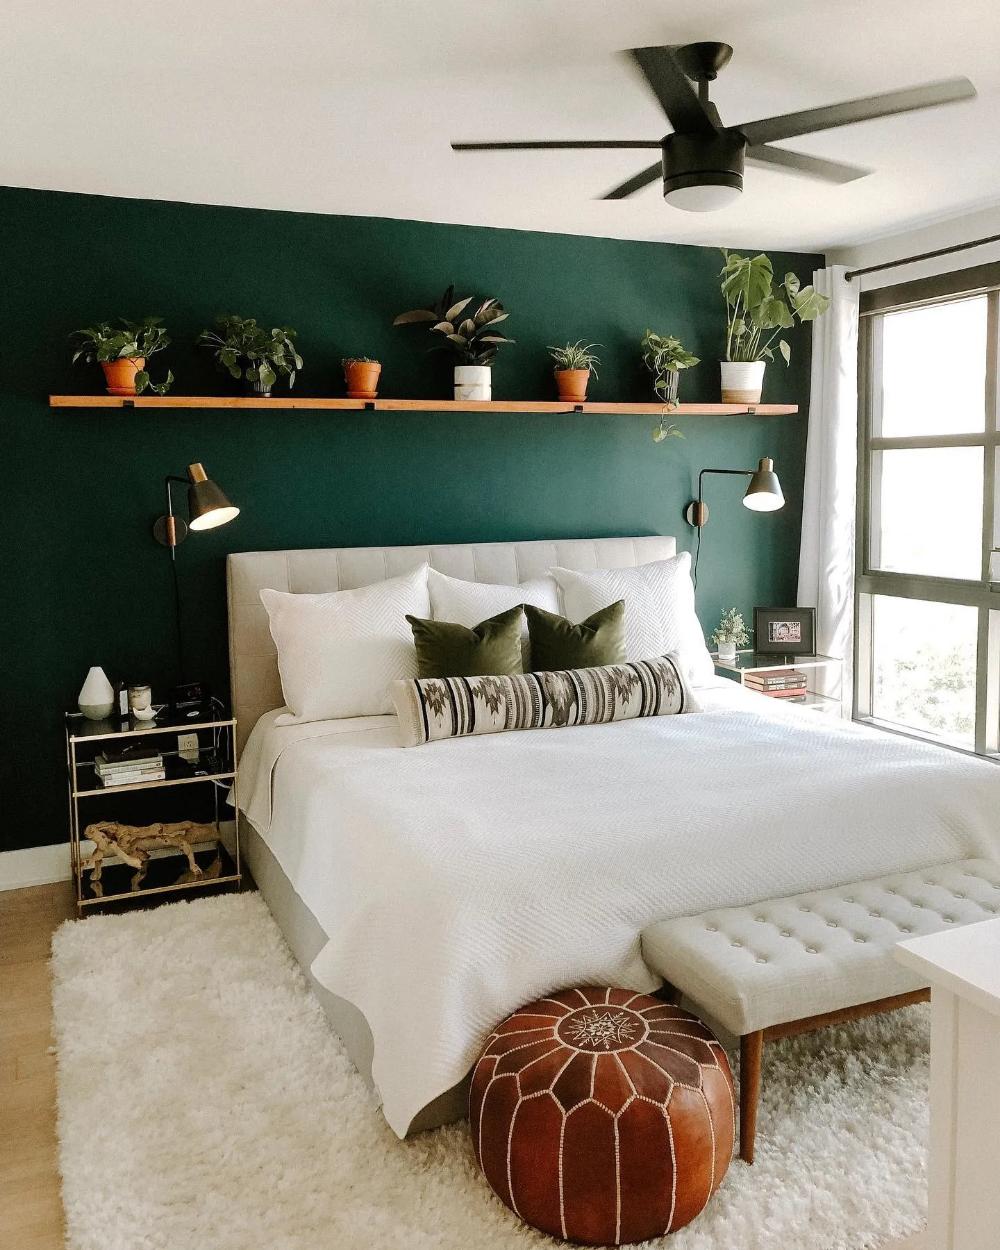 Lito Almond Cream Queen Headboard Almond Antiquedecor Apartmentdecor B In 2020 Green Bedroom Walls Bedroom Interior Bedroom Green